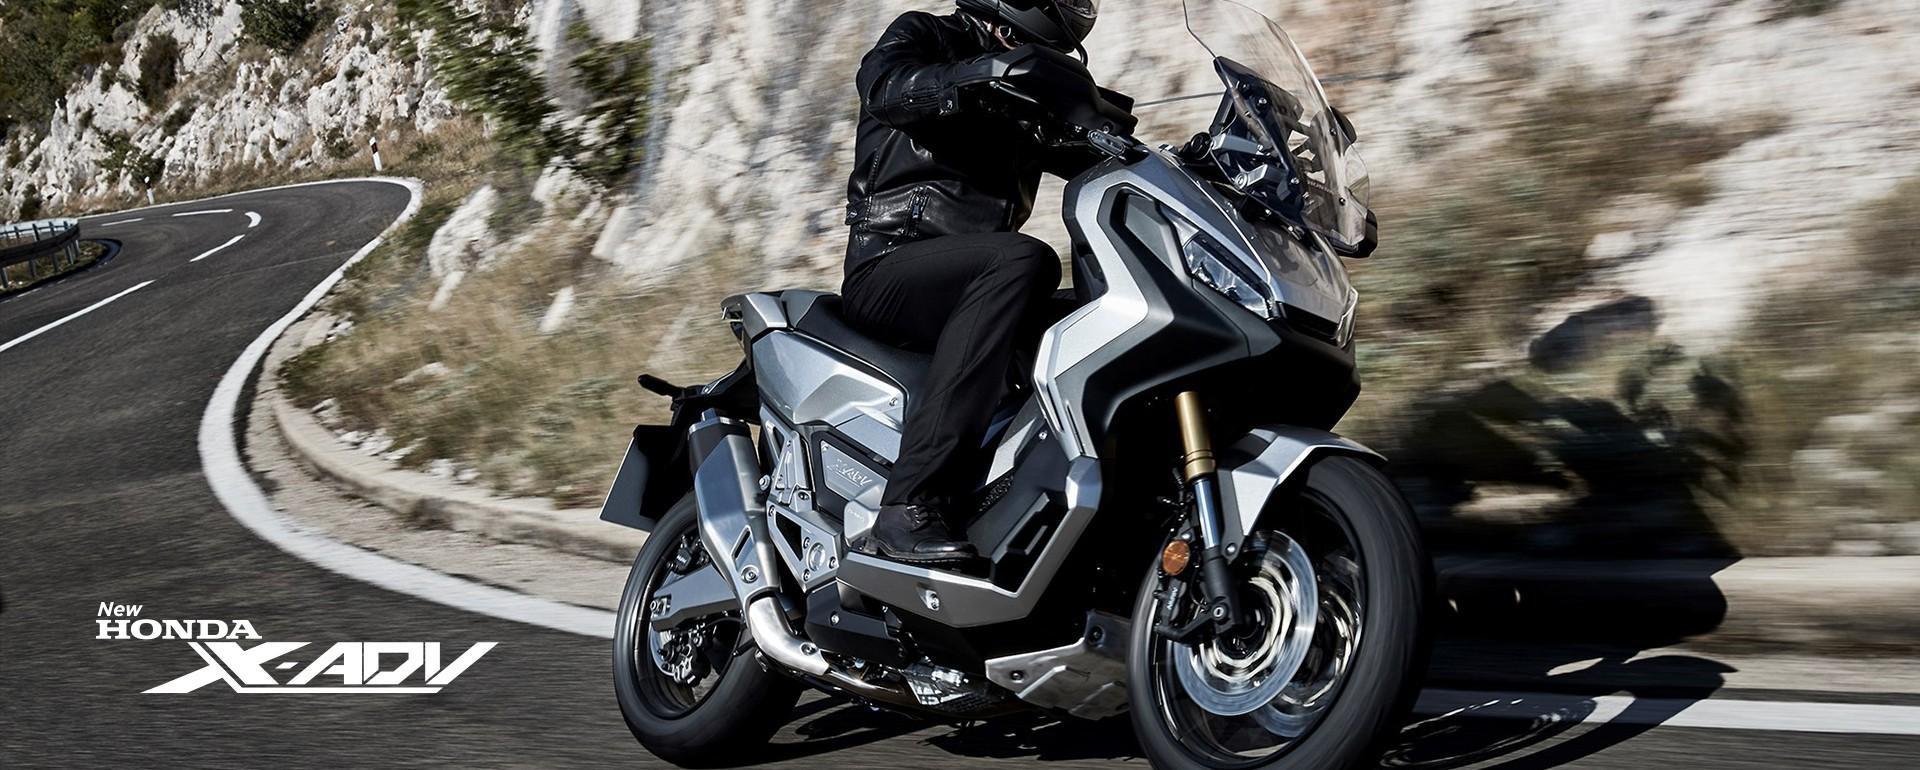 Honda-bigbike-Motorcycle-มอเตอร์ไซค์-บิ๊กไบค์-ฮอนด้า-Honda X-ADV-Banner